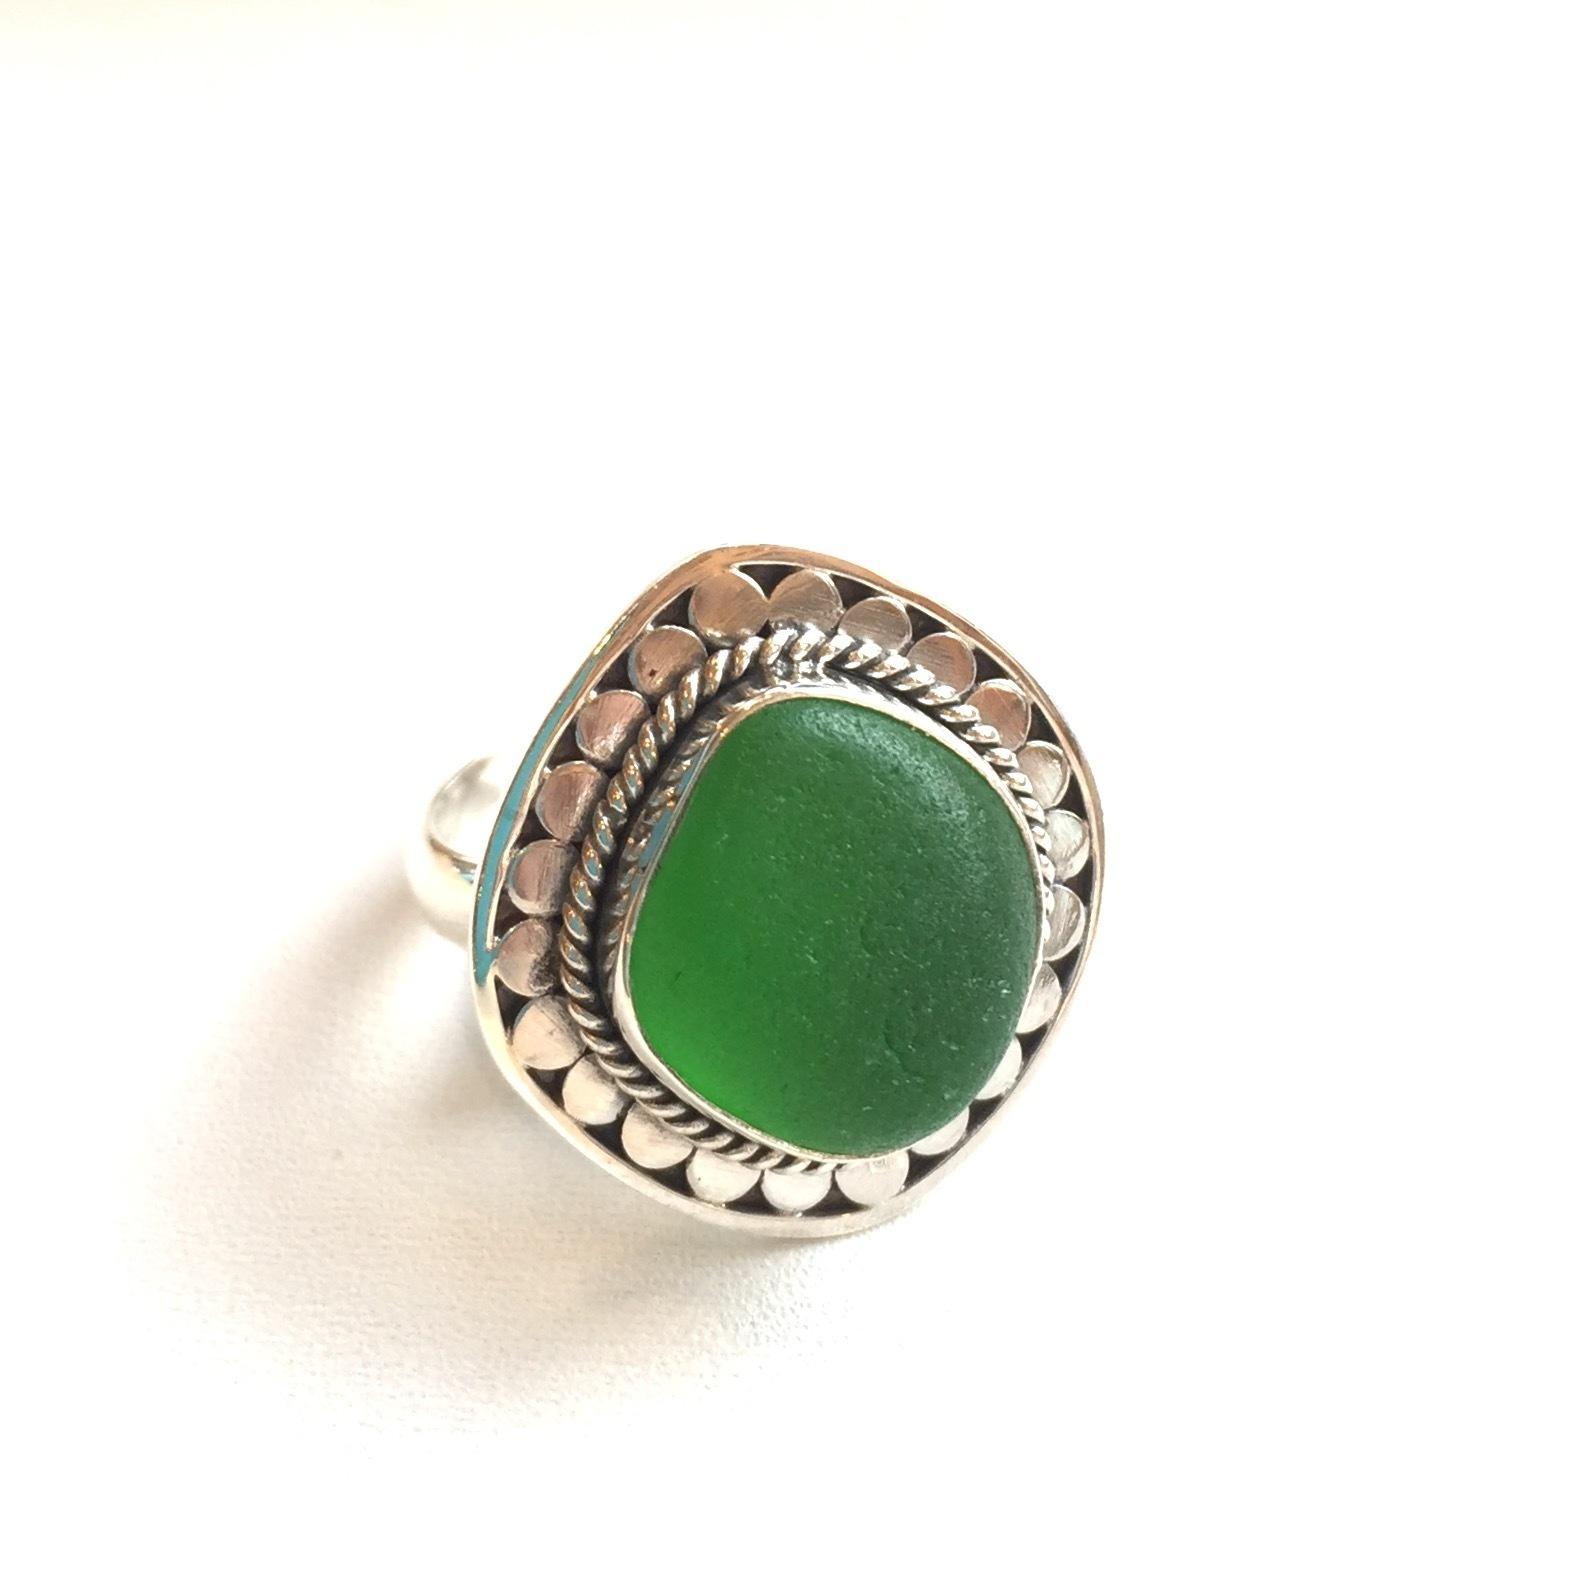 Cayden sea glass ring in kelly green